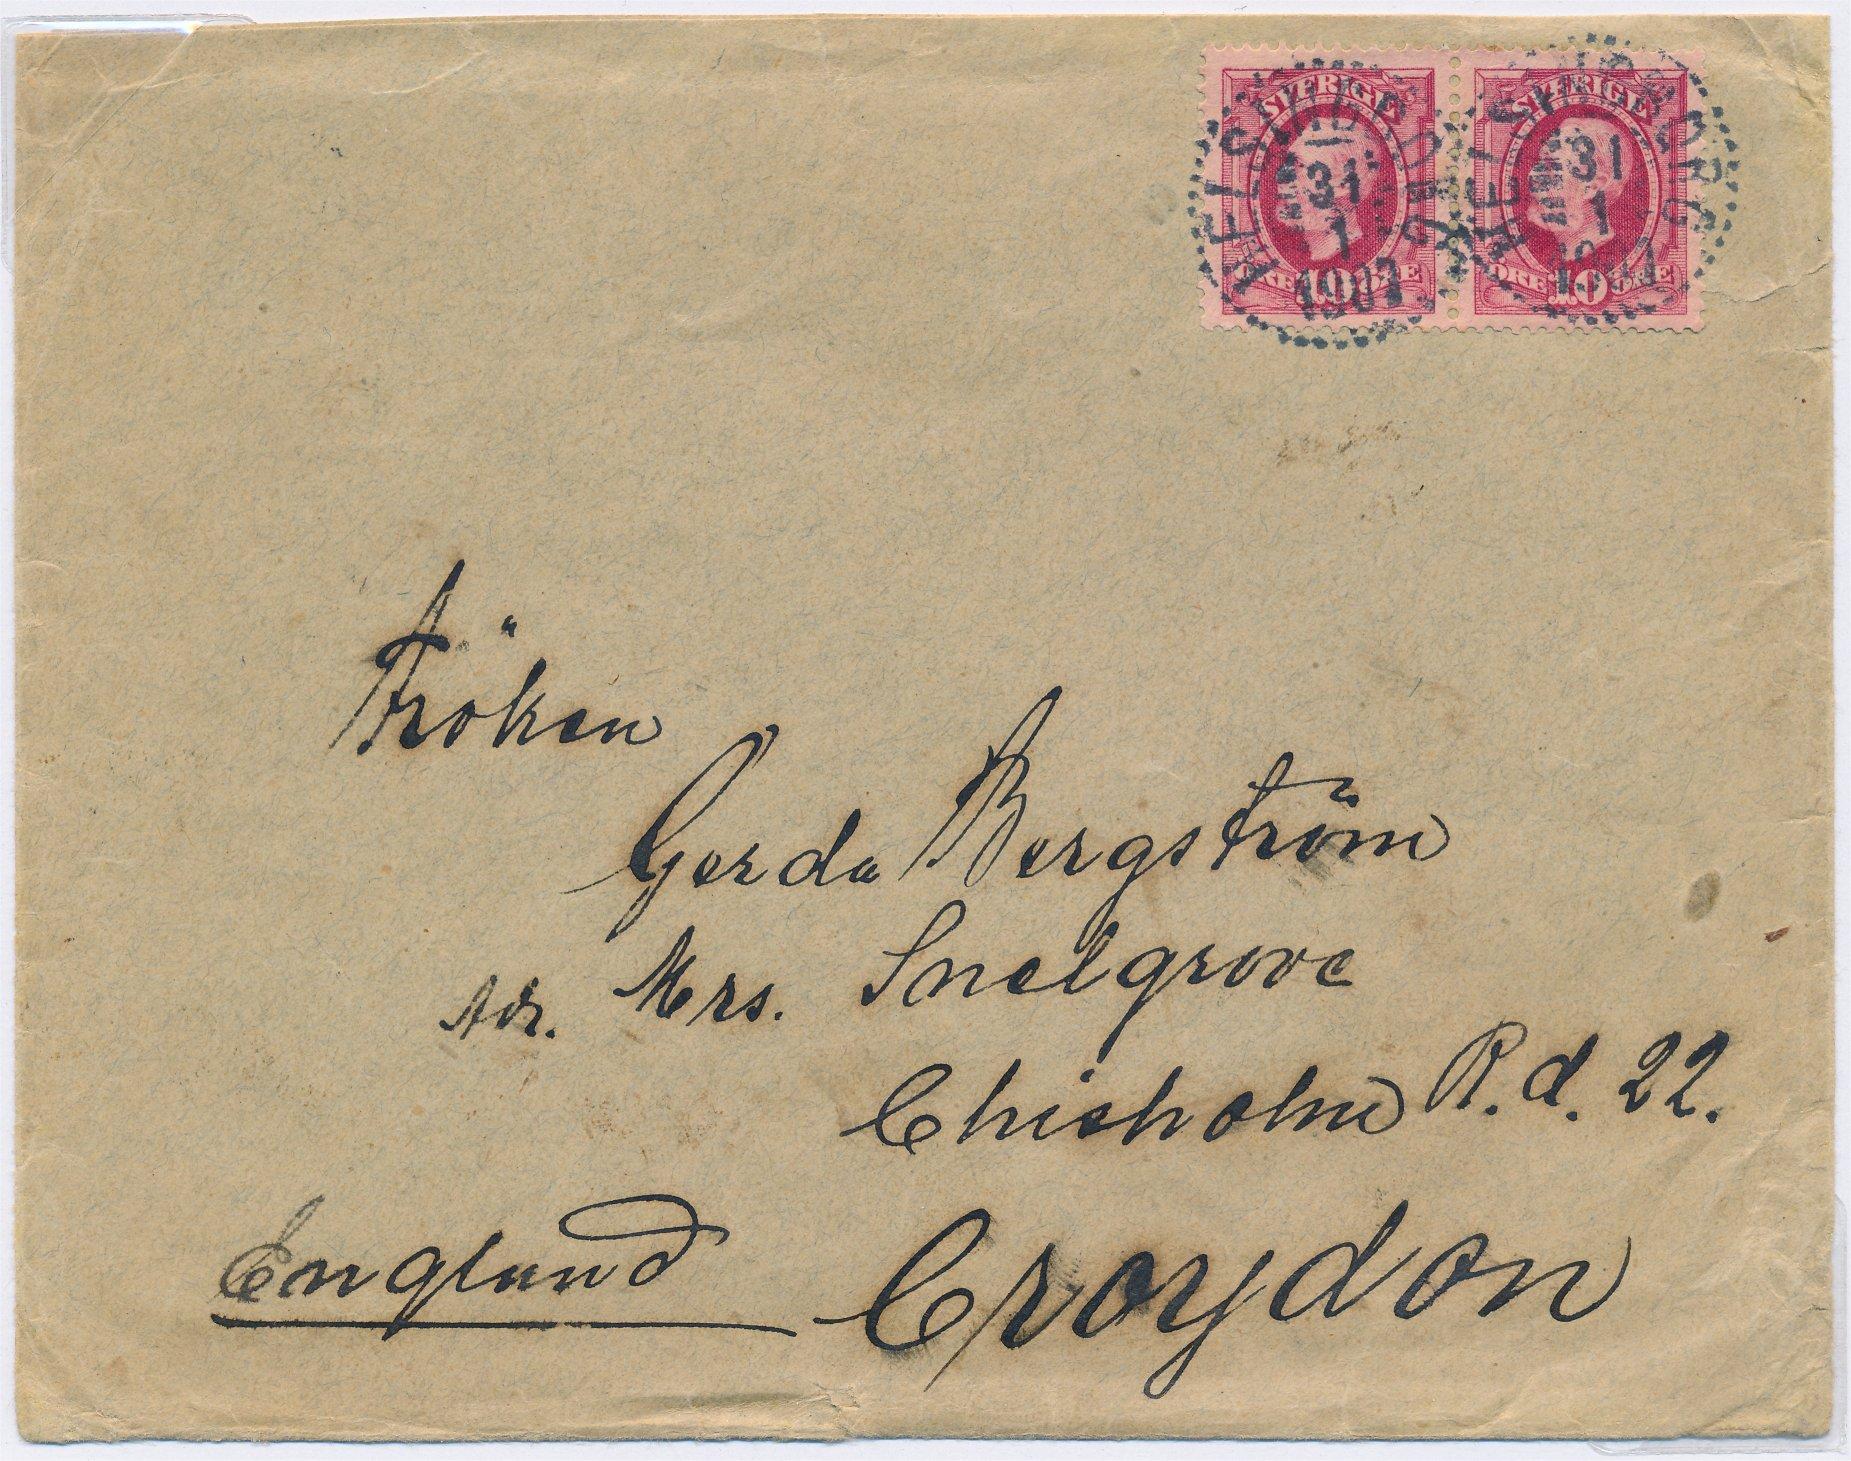 20_helsingborg_31_1_1907